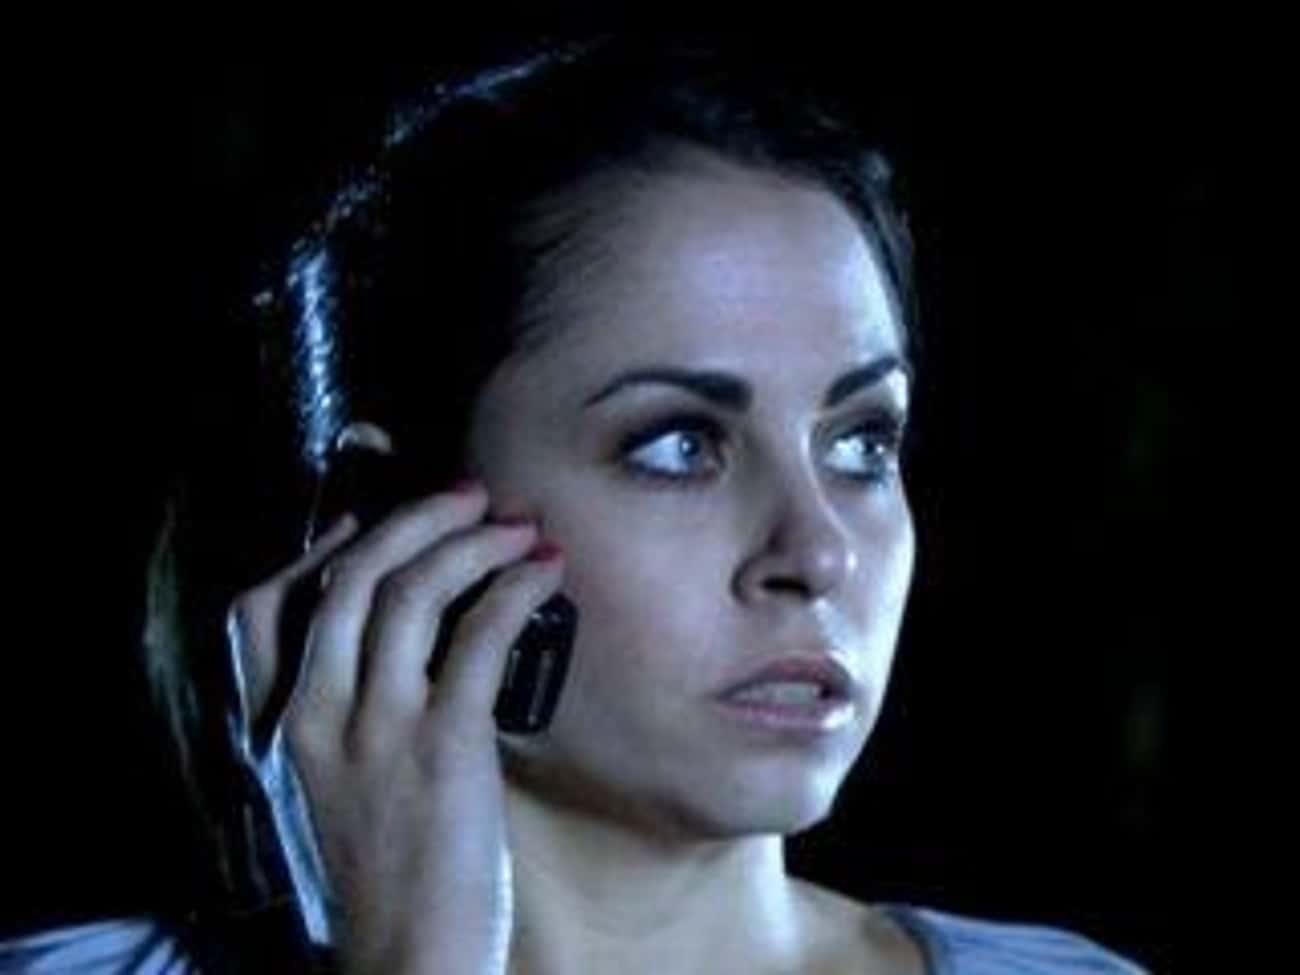 Lindsay - 'The Human Centipede'